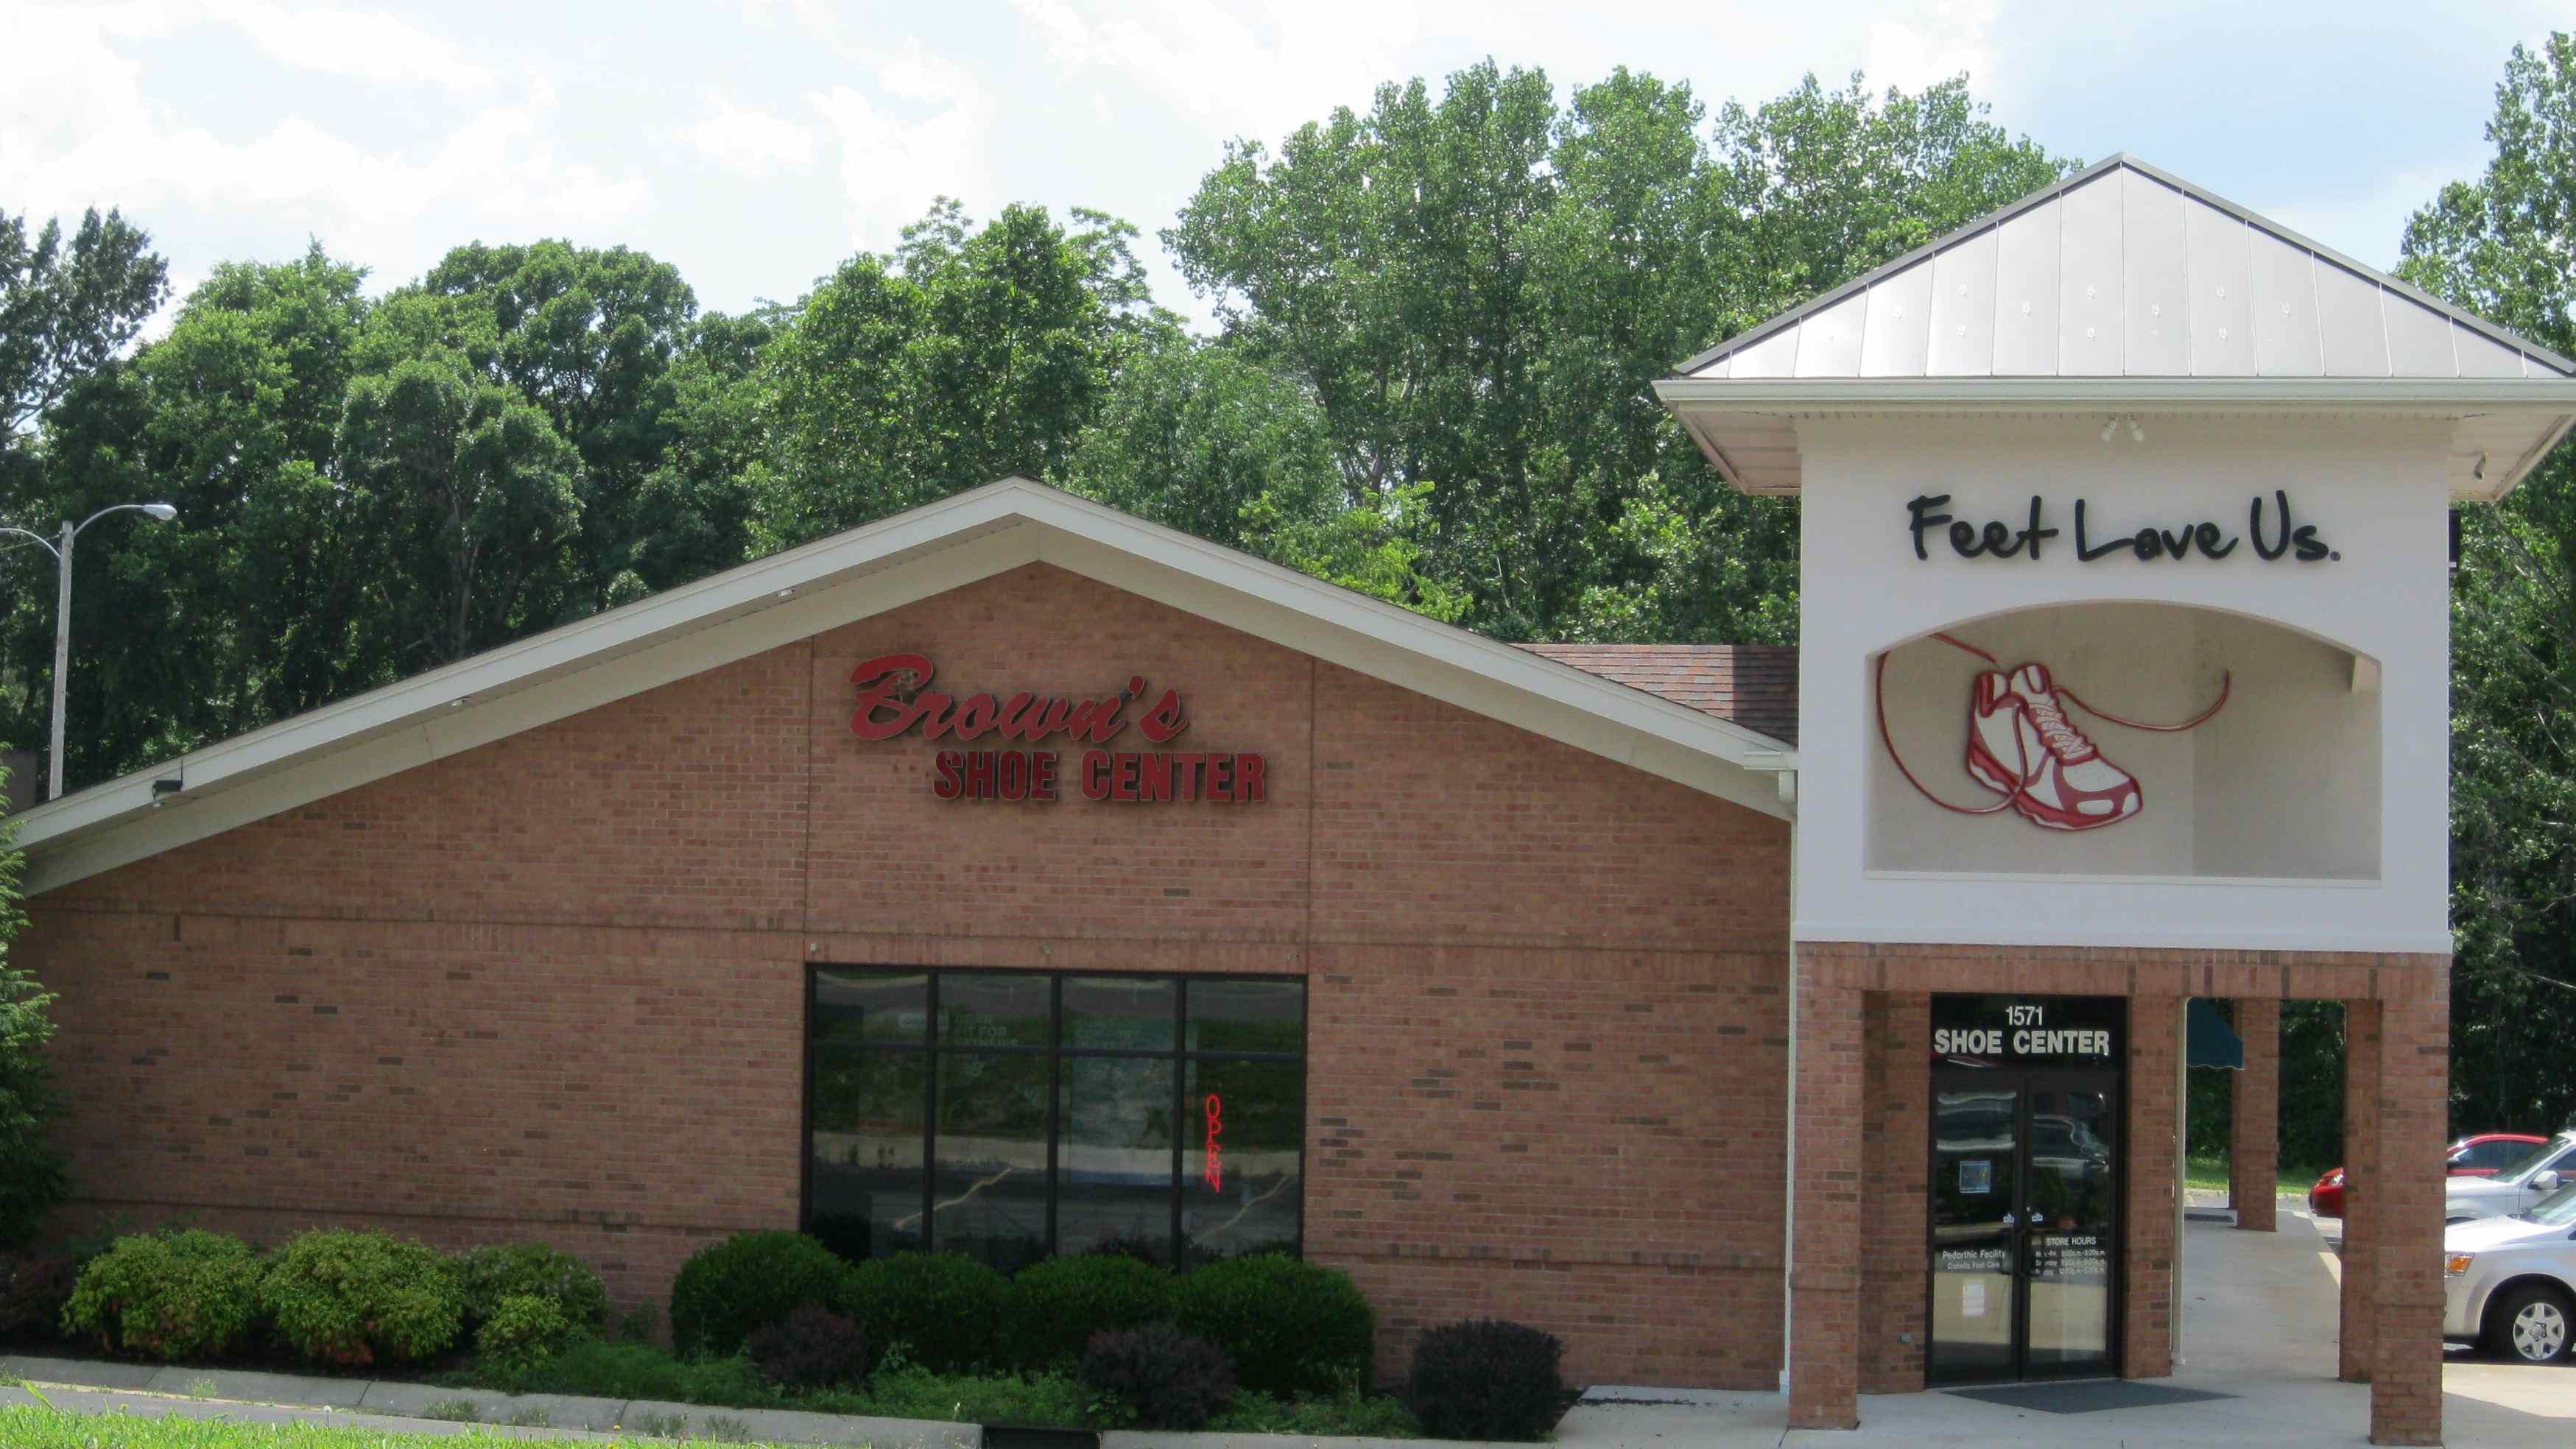 Brown's Shoe Center